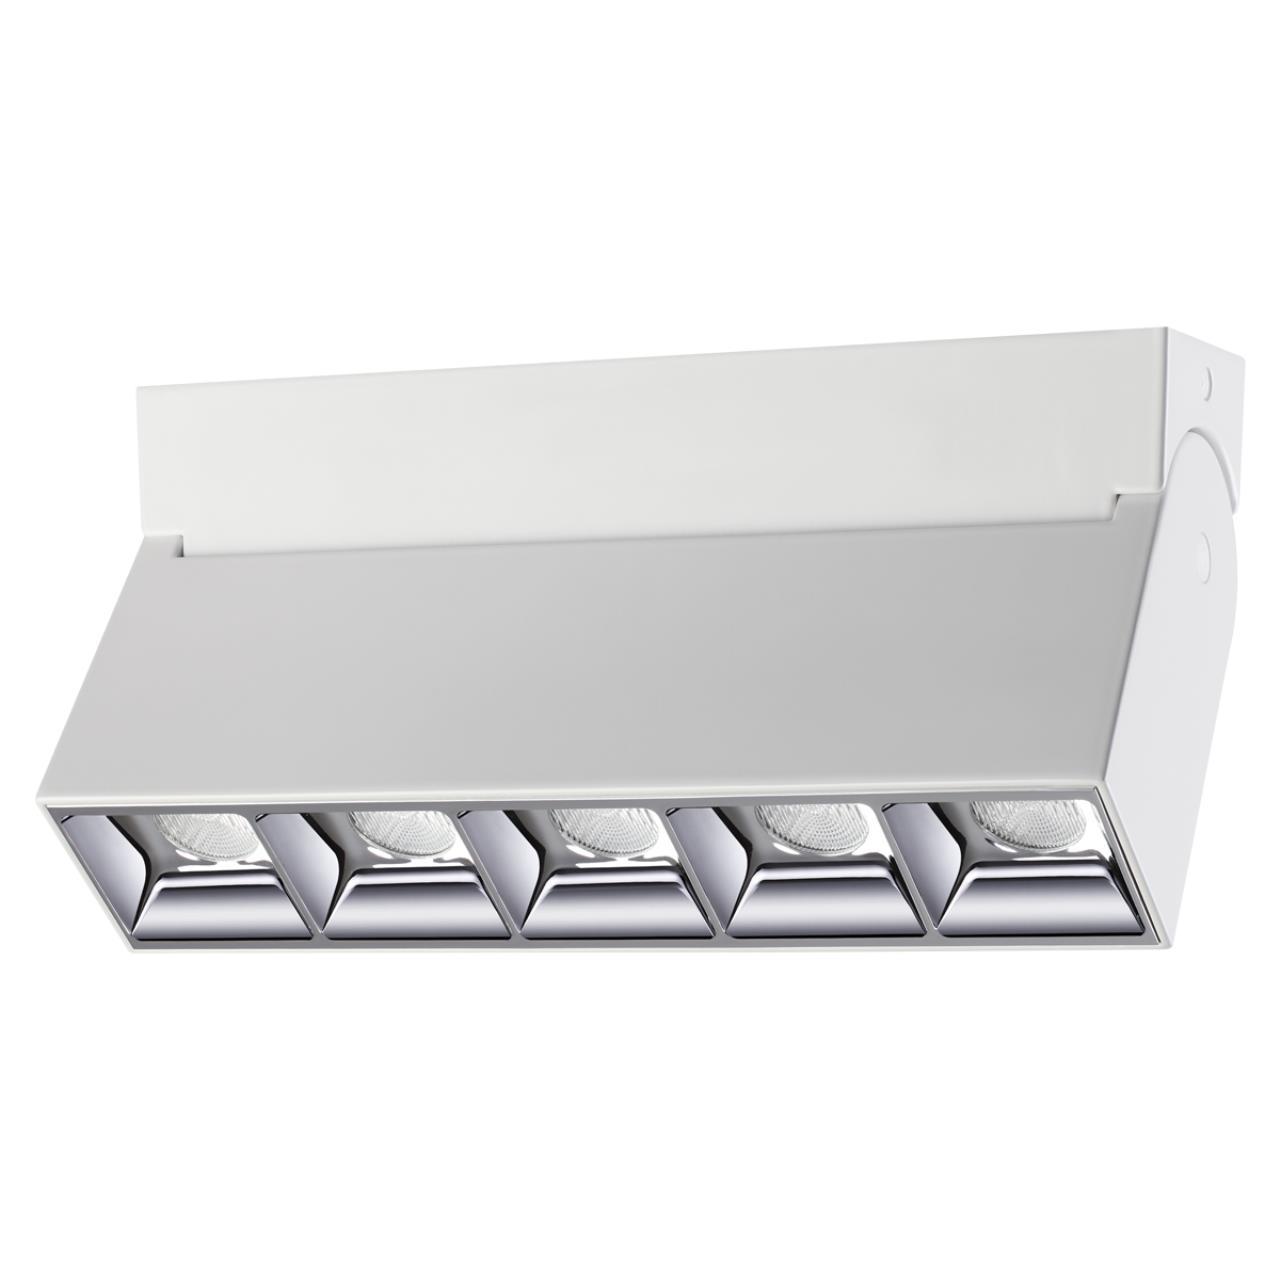 358320 OVER NT19 000 белый Светильник накладной IP33 LED 4000К 25W 110-265V EOS